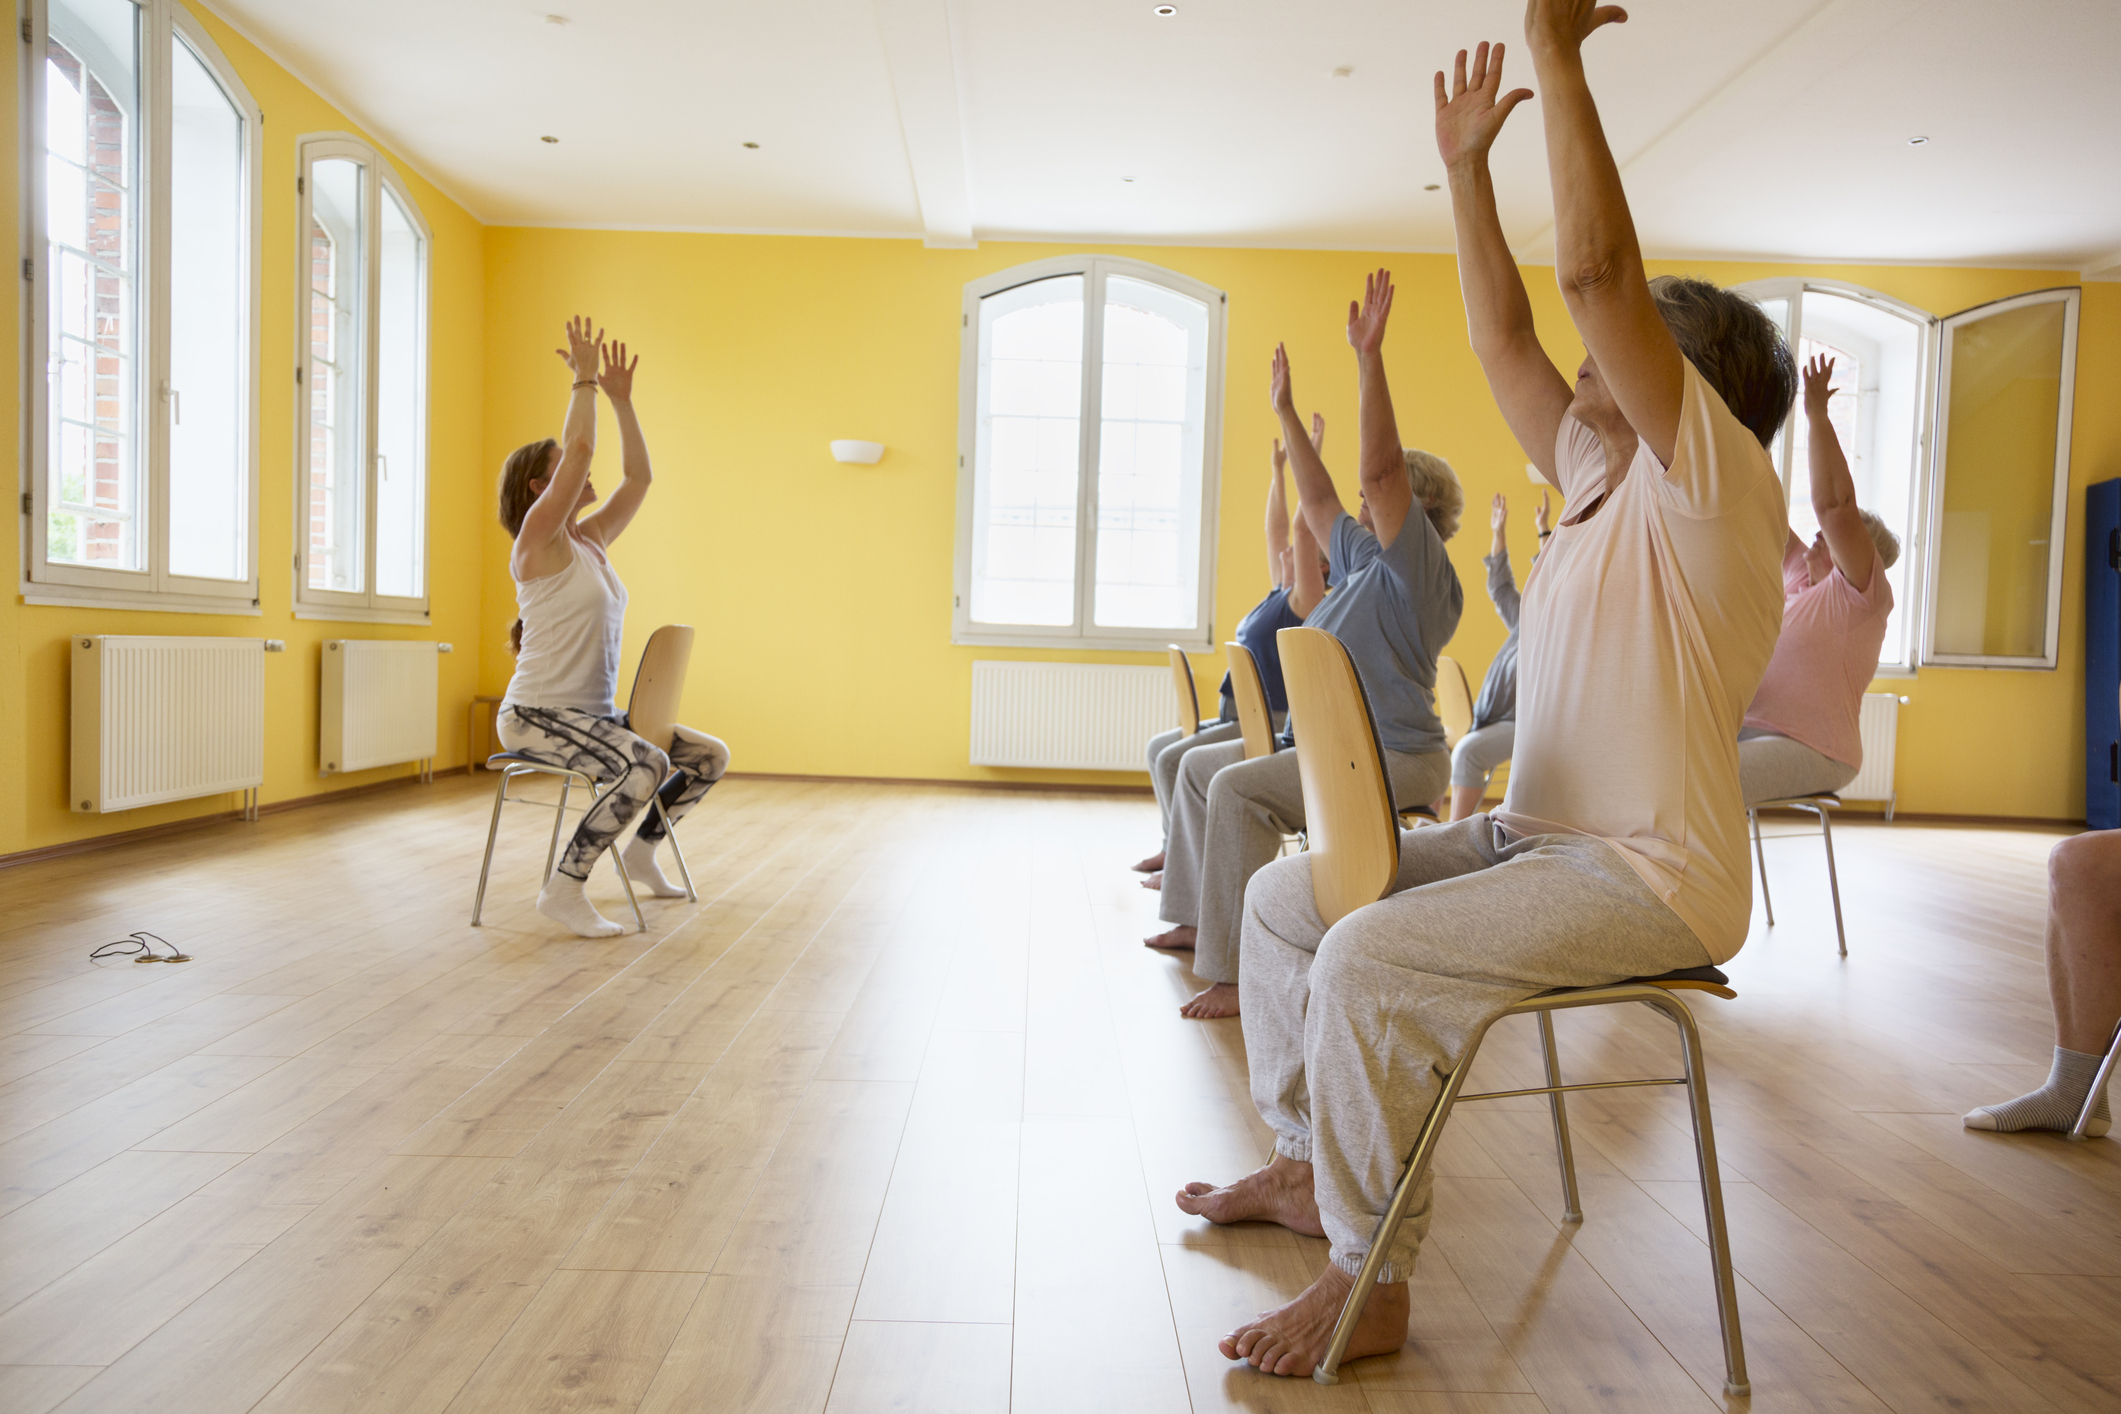 truest-intention-as-a-yoga-teacher-joanna-griffin-online-yoga-training